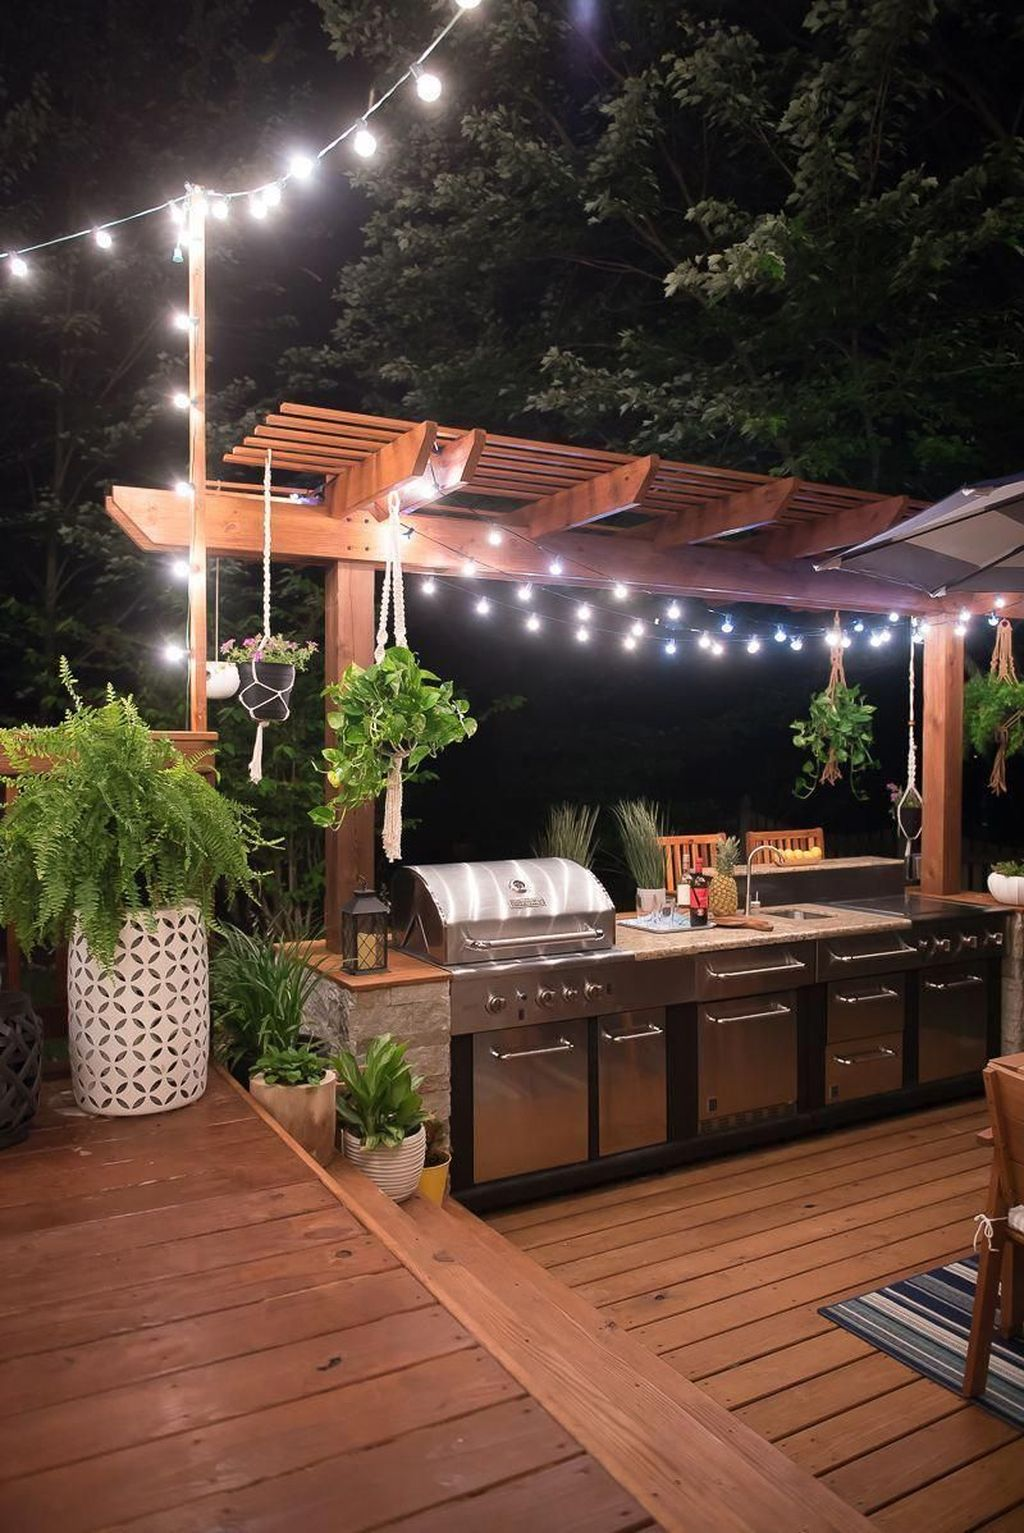 Stunning Outdoor Kitchen Design Ideas For Perfect Summer 22